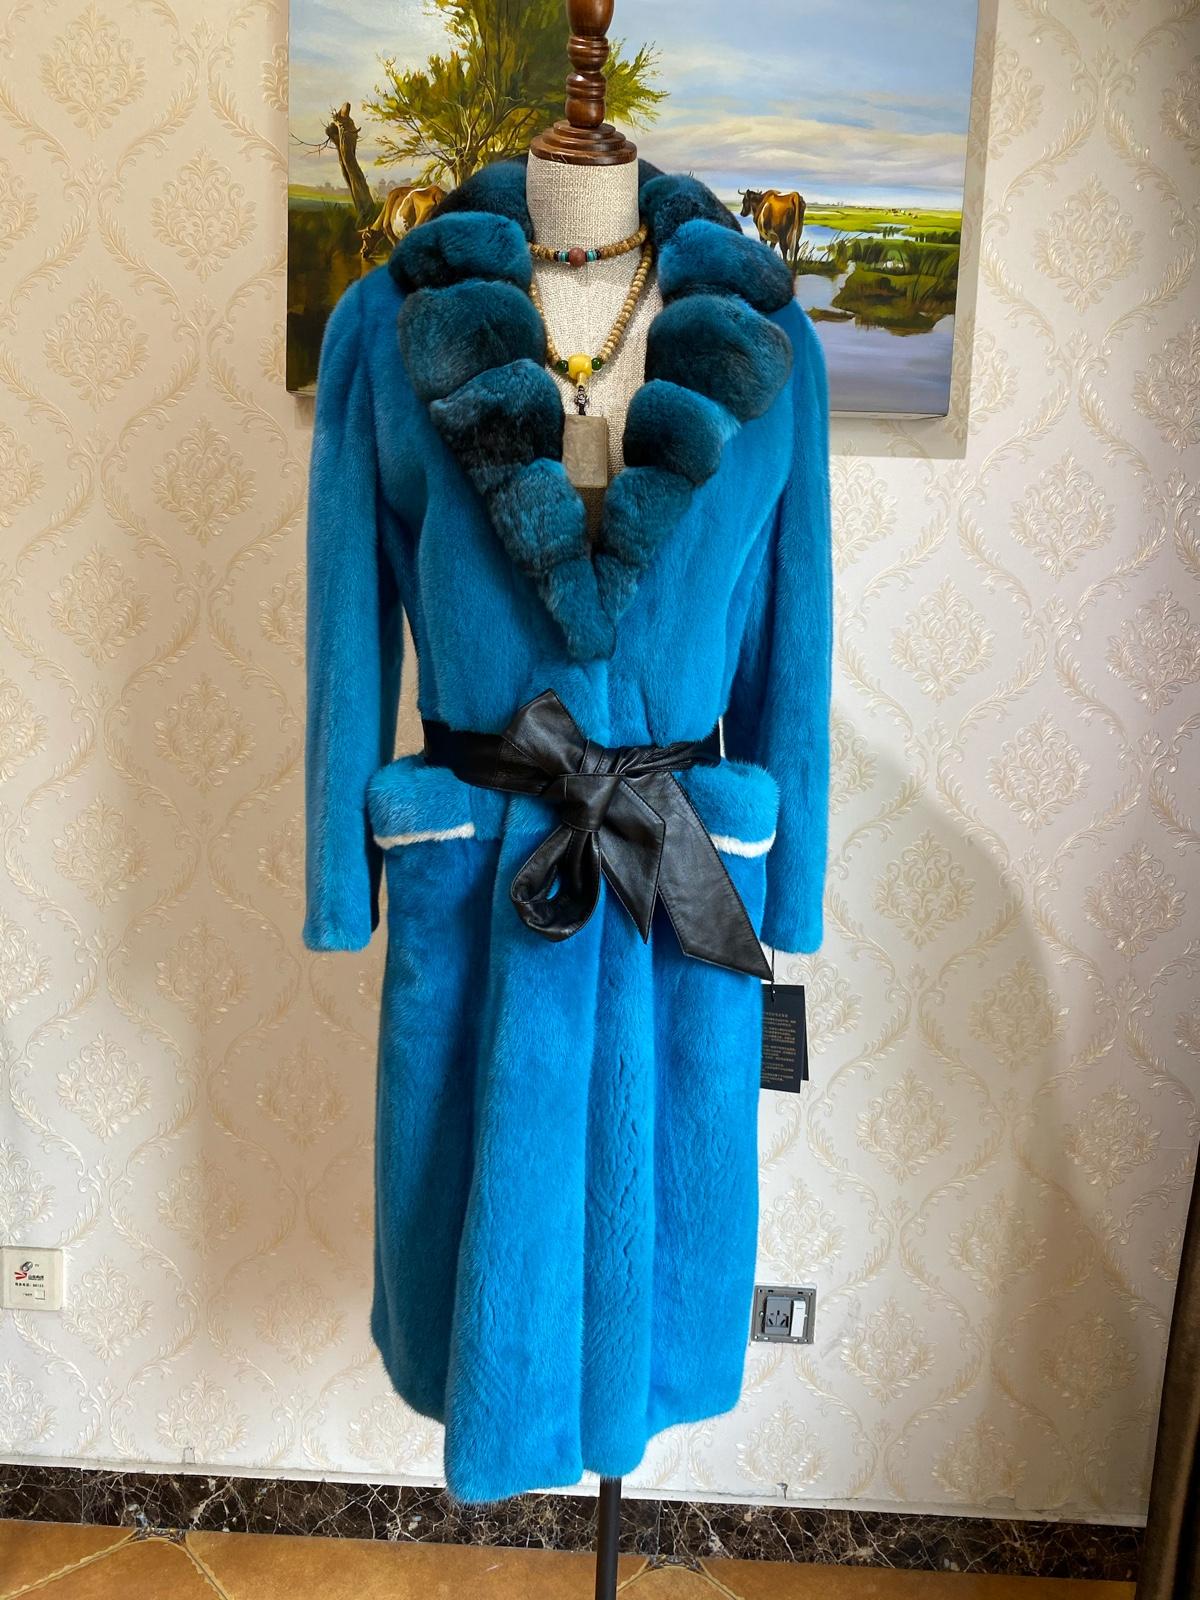 New imported chinchilla suit neckline Copenhagen purple velvet high end fur